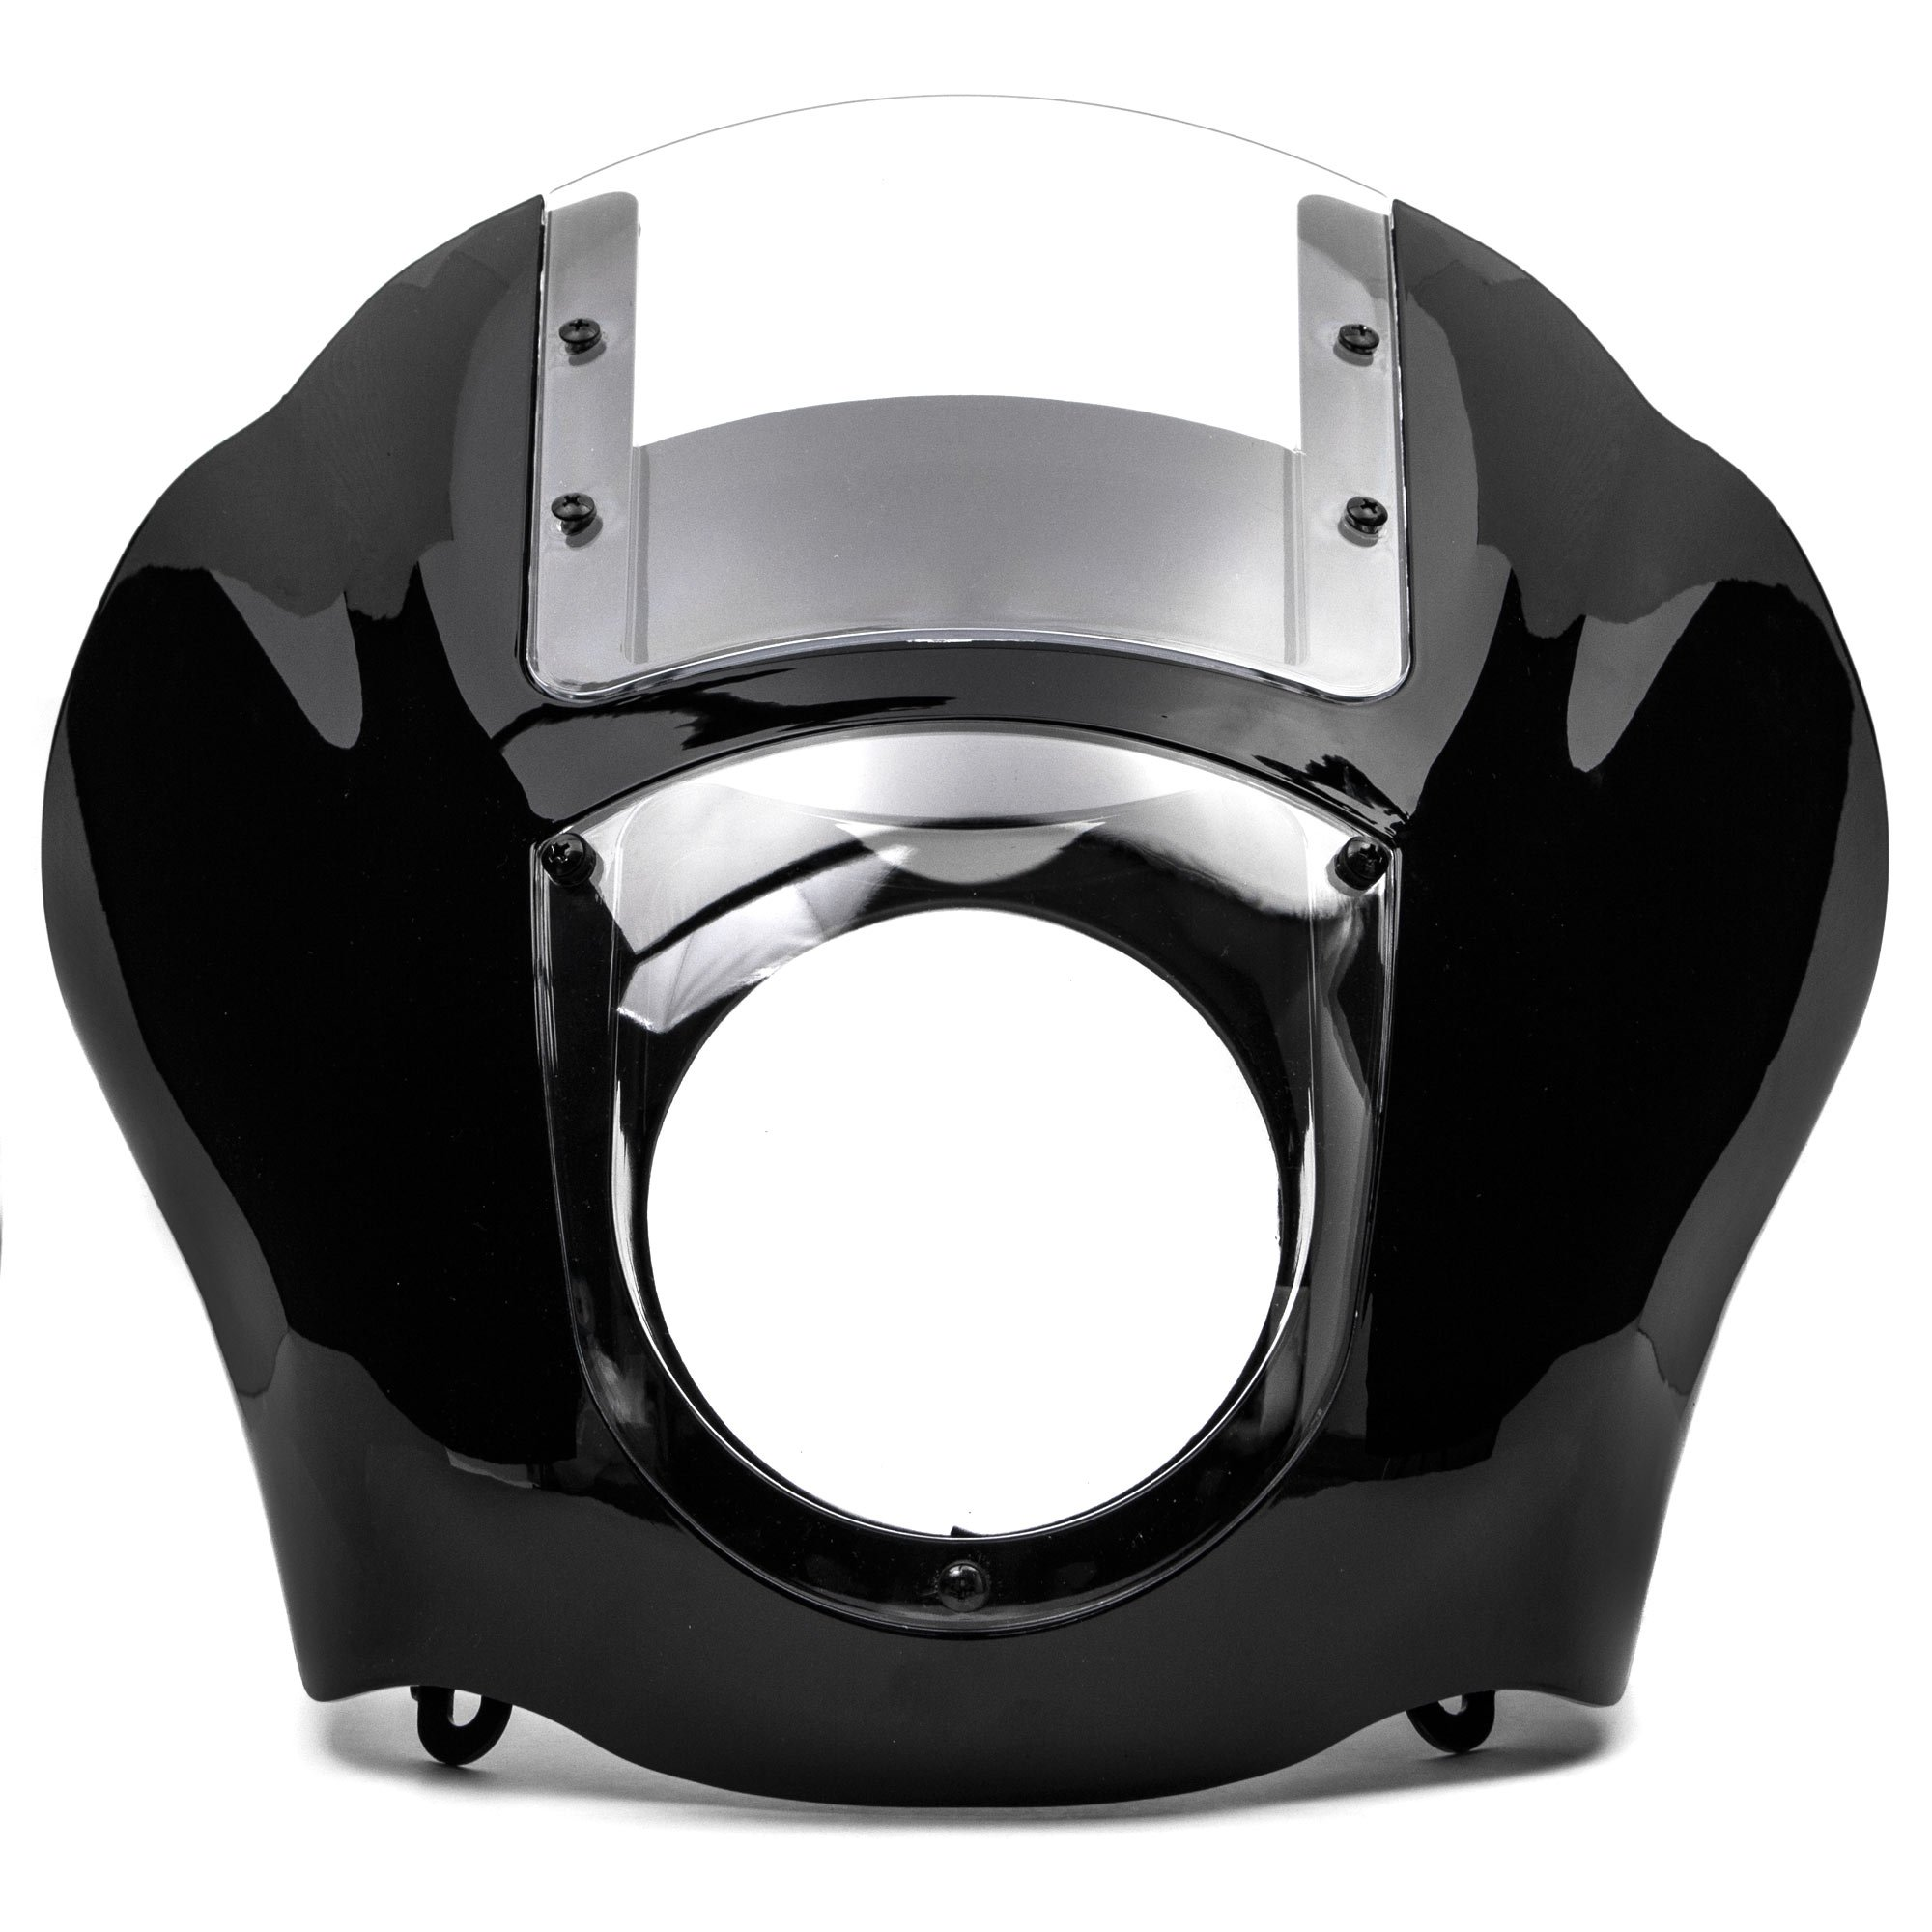 Krator NEW Black & Clear Quarter Fairing Windshield Kit for Harley Davidson XL FXR Dyna